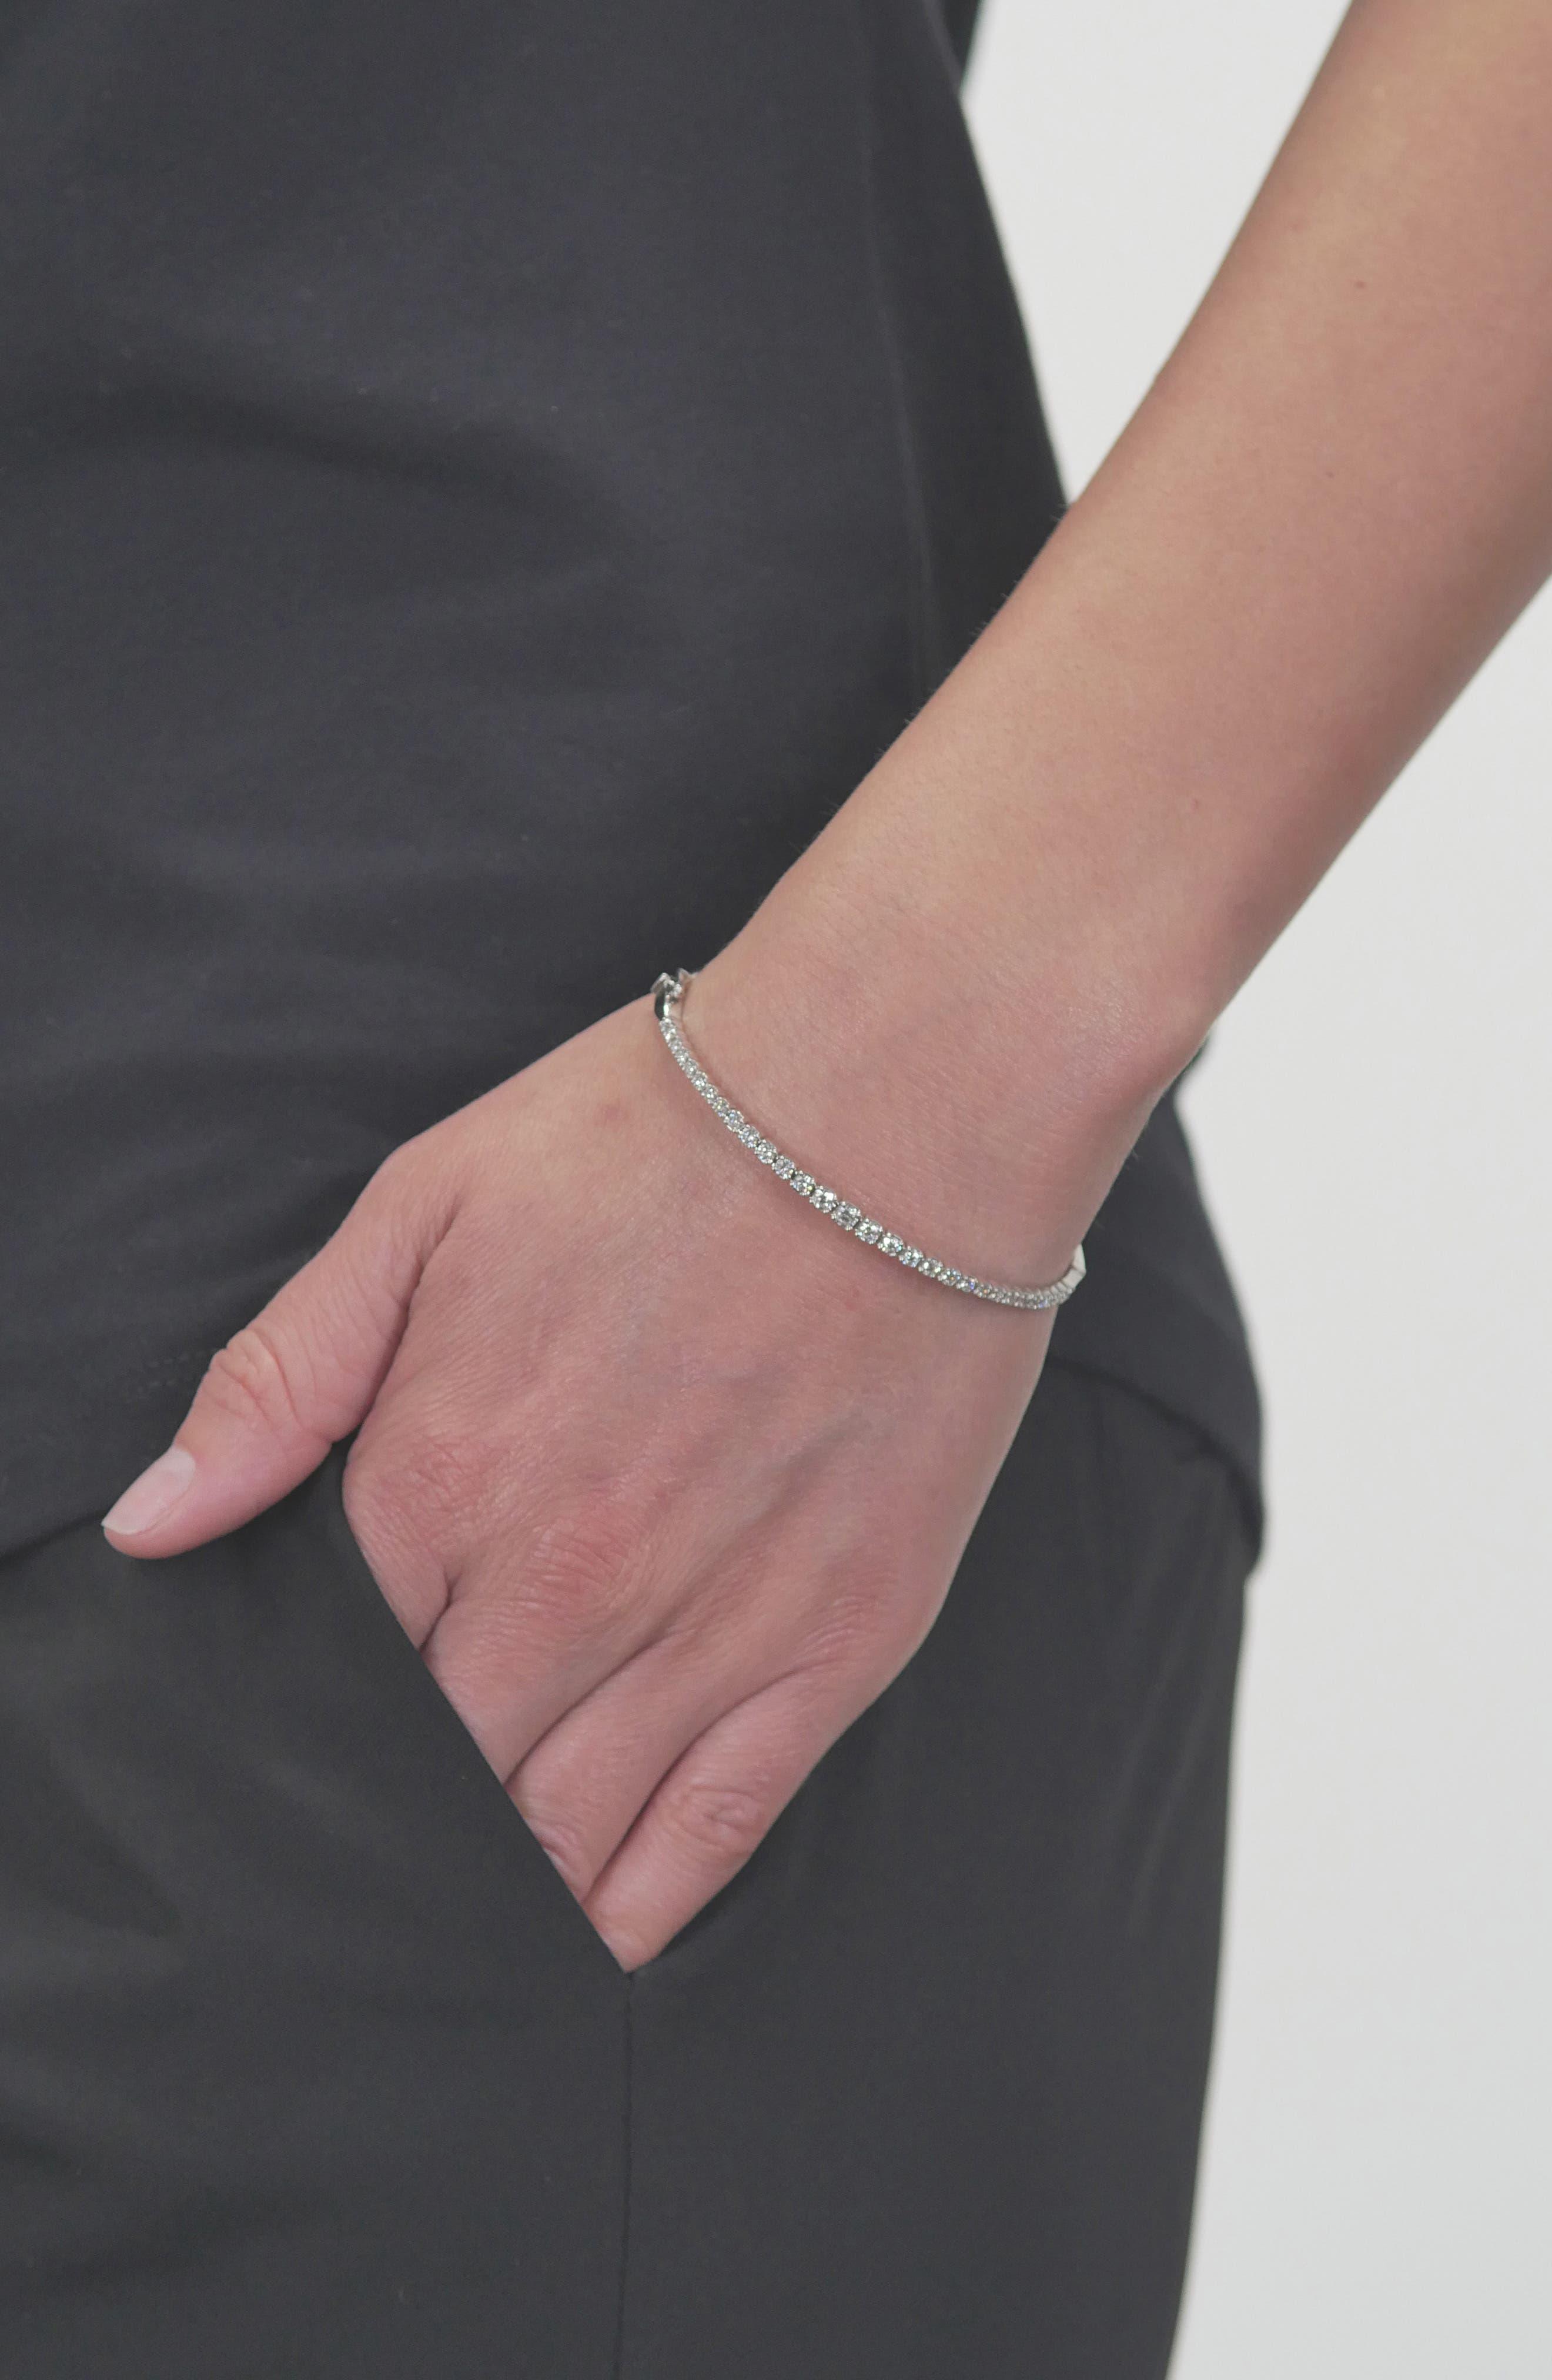 Bardot Diamond Bracelet,                             Alternate thumbnail 2, color,                             WHITE GOLD/ DIAMOND